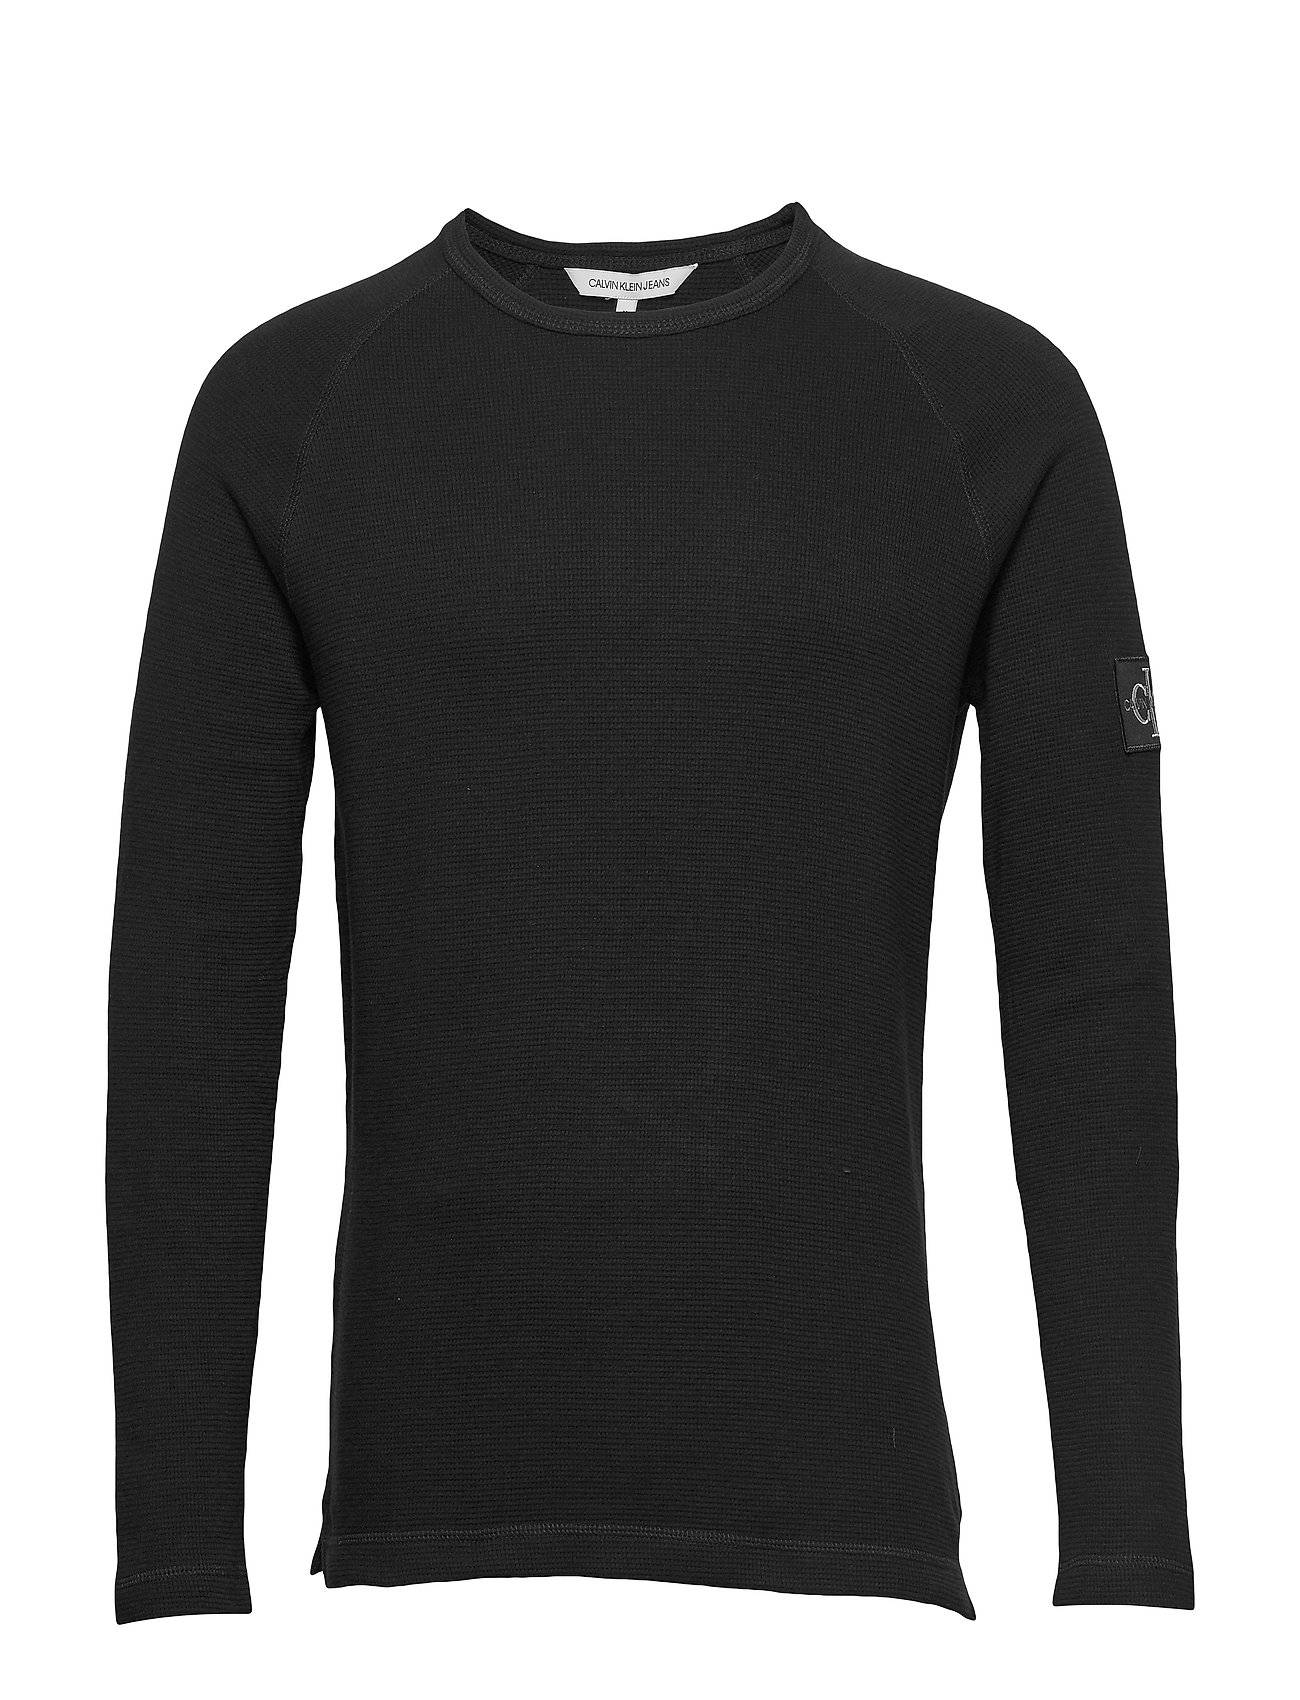 Image of Calvin Waffle Monogram Sleeve Slim L/S T-shirts Long-sleeved Musta Calvin Klein Jeans